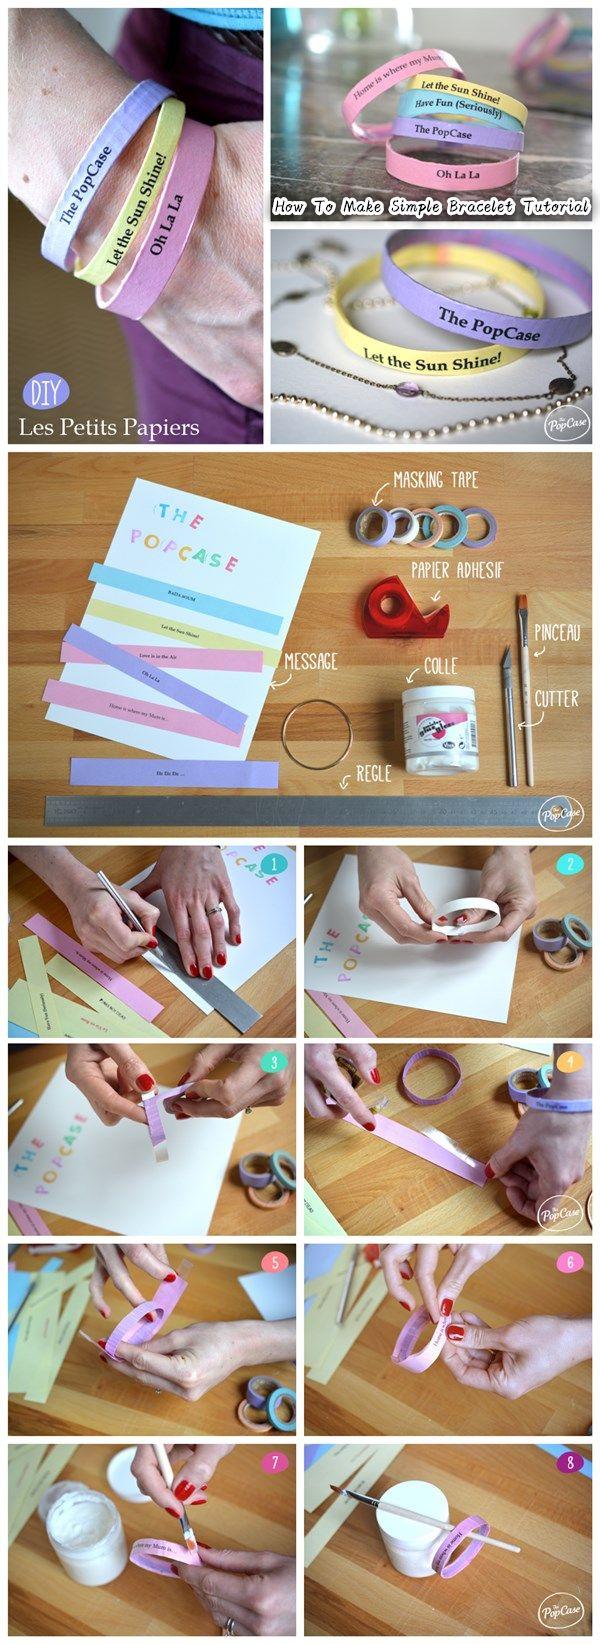 How To Make Simple Bracelet Tutorial